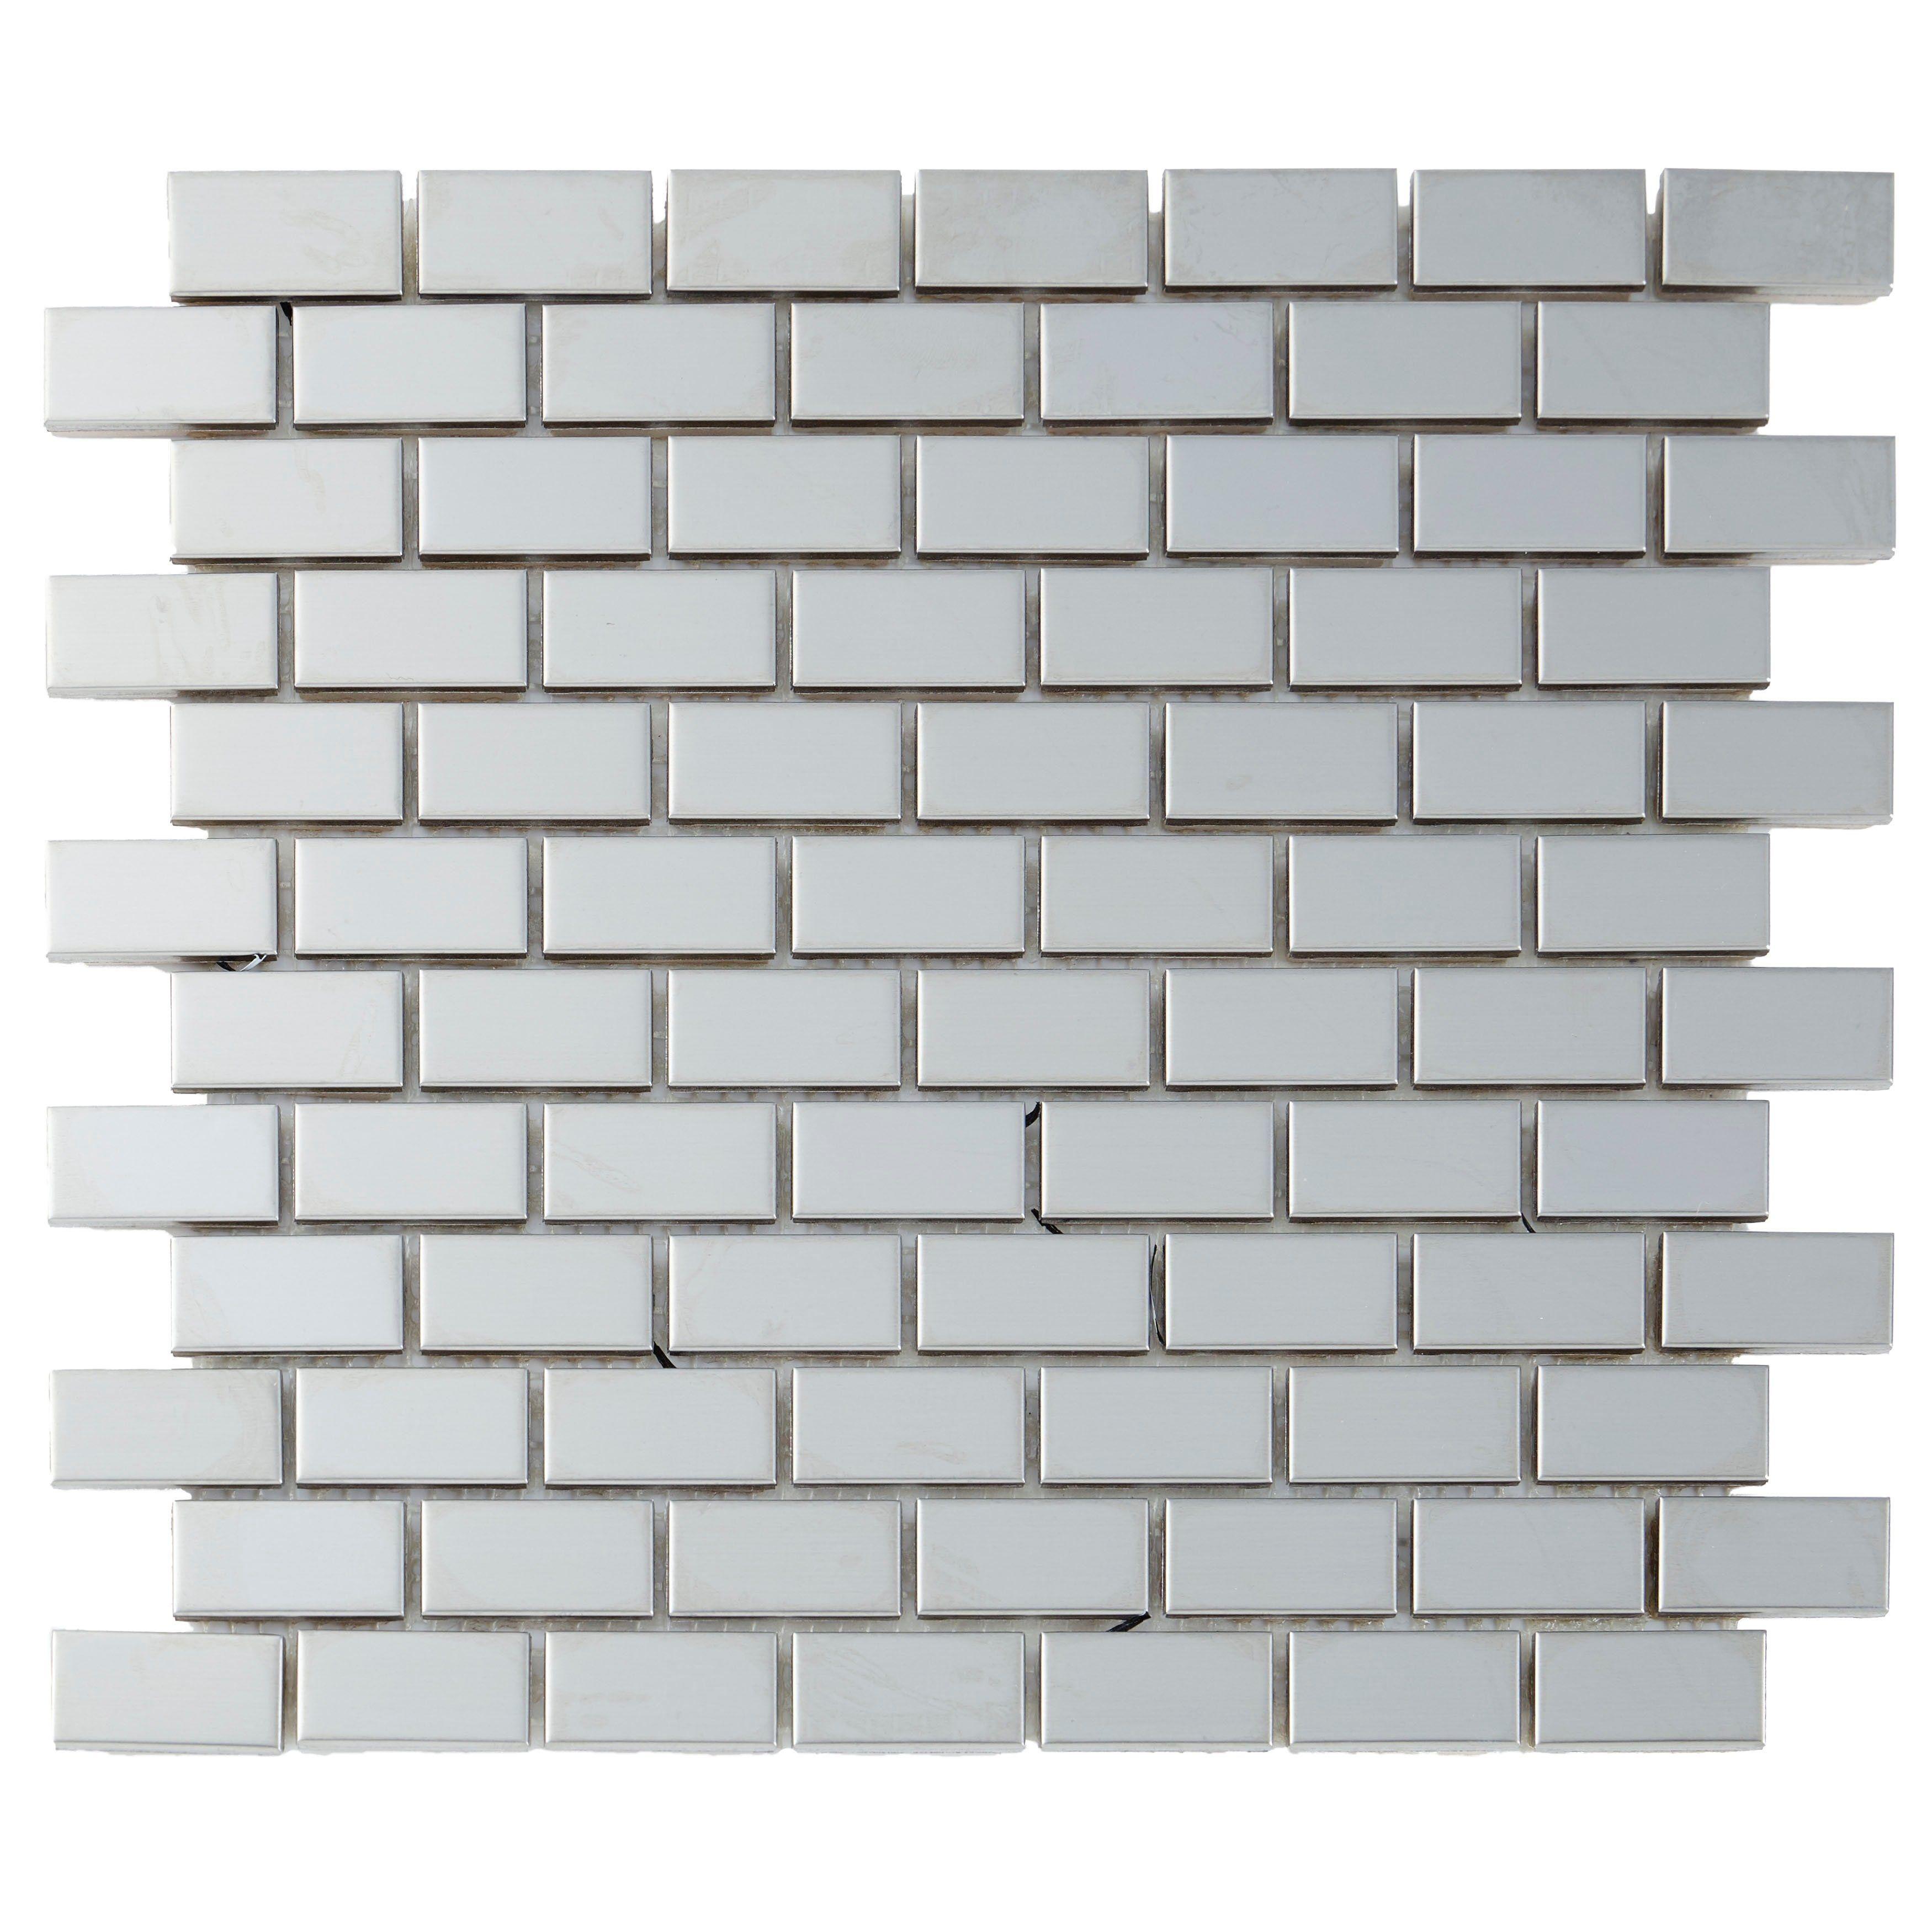 2x2 Ceramic Mosaic Stone Looking 12x24 Mosaic Sheet Masso 24 X 12 Sample Gray Ceramic Mosaic Tile Mosaic Tiles Stone Mosaic Tile